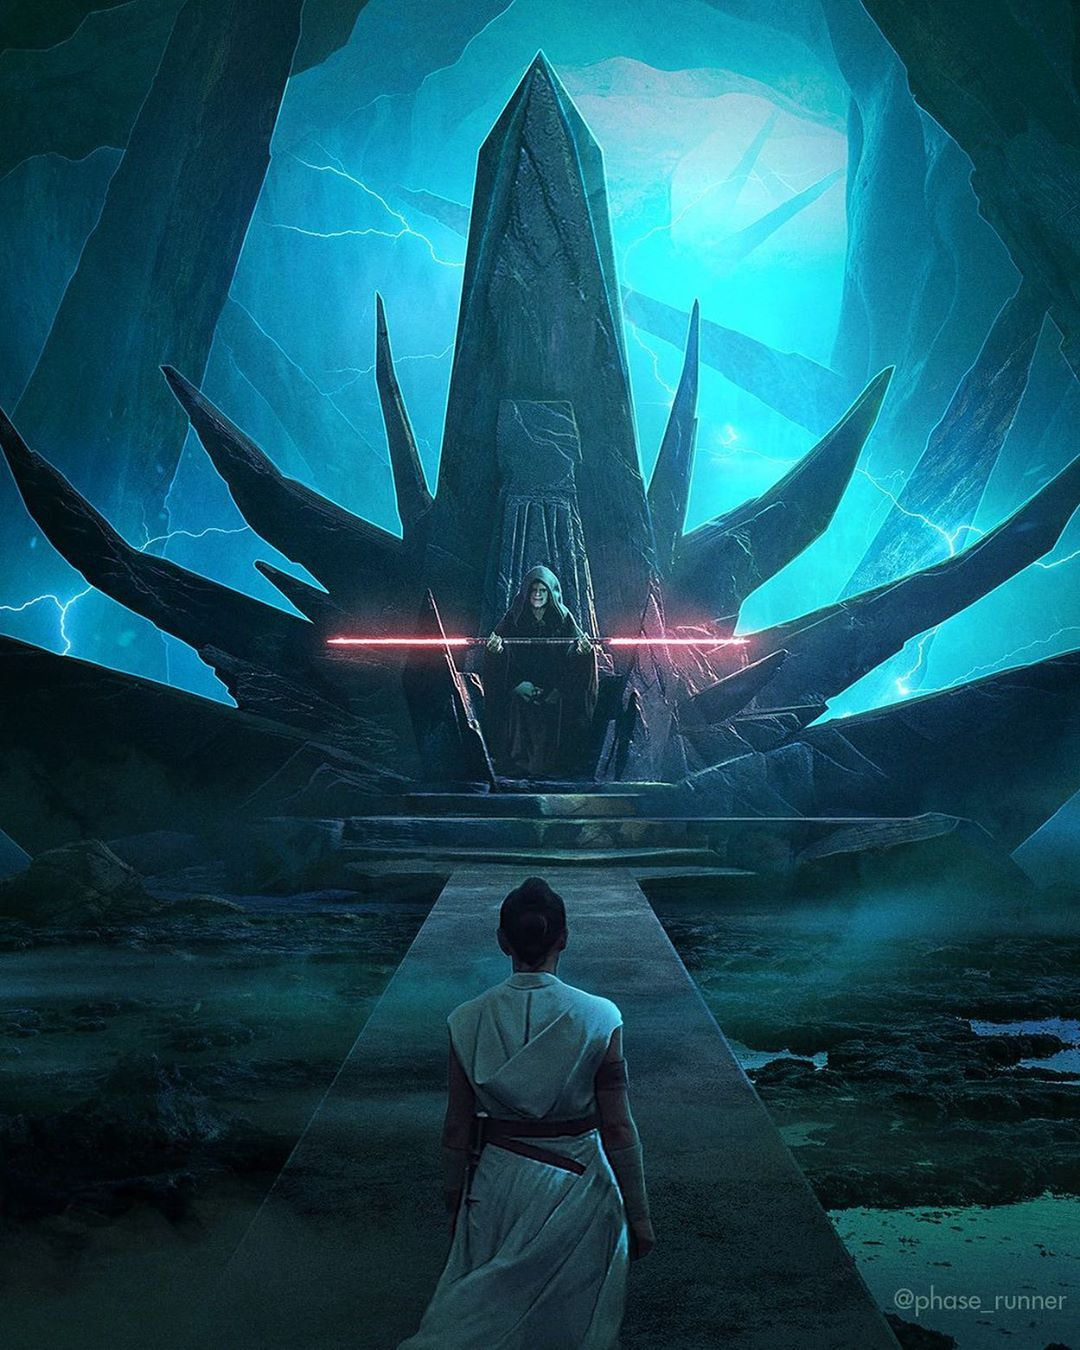 Awesome Concept Art Of Rey And Emperor Palpatine In Rise Of Skywalker Starwars Starwarsart Rey Palp In 2020 Star Wars Pictures Star Wars Artwork Star Wars Images